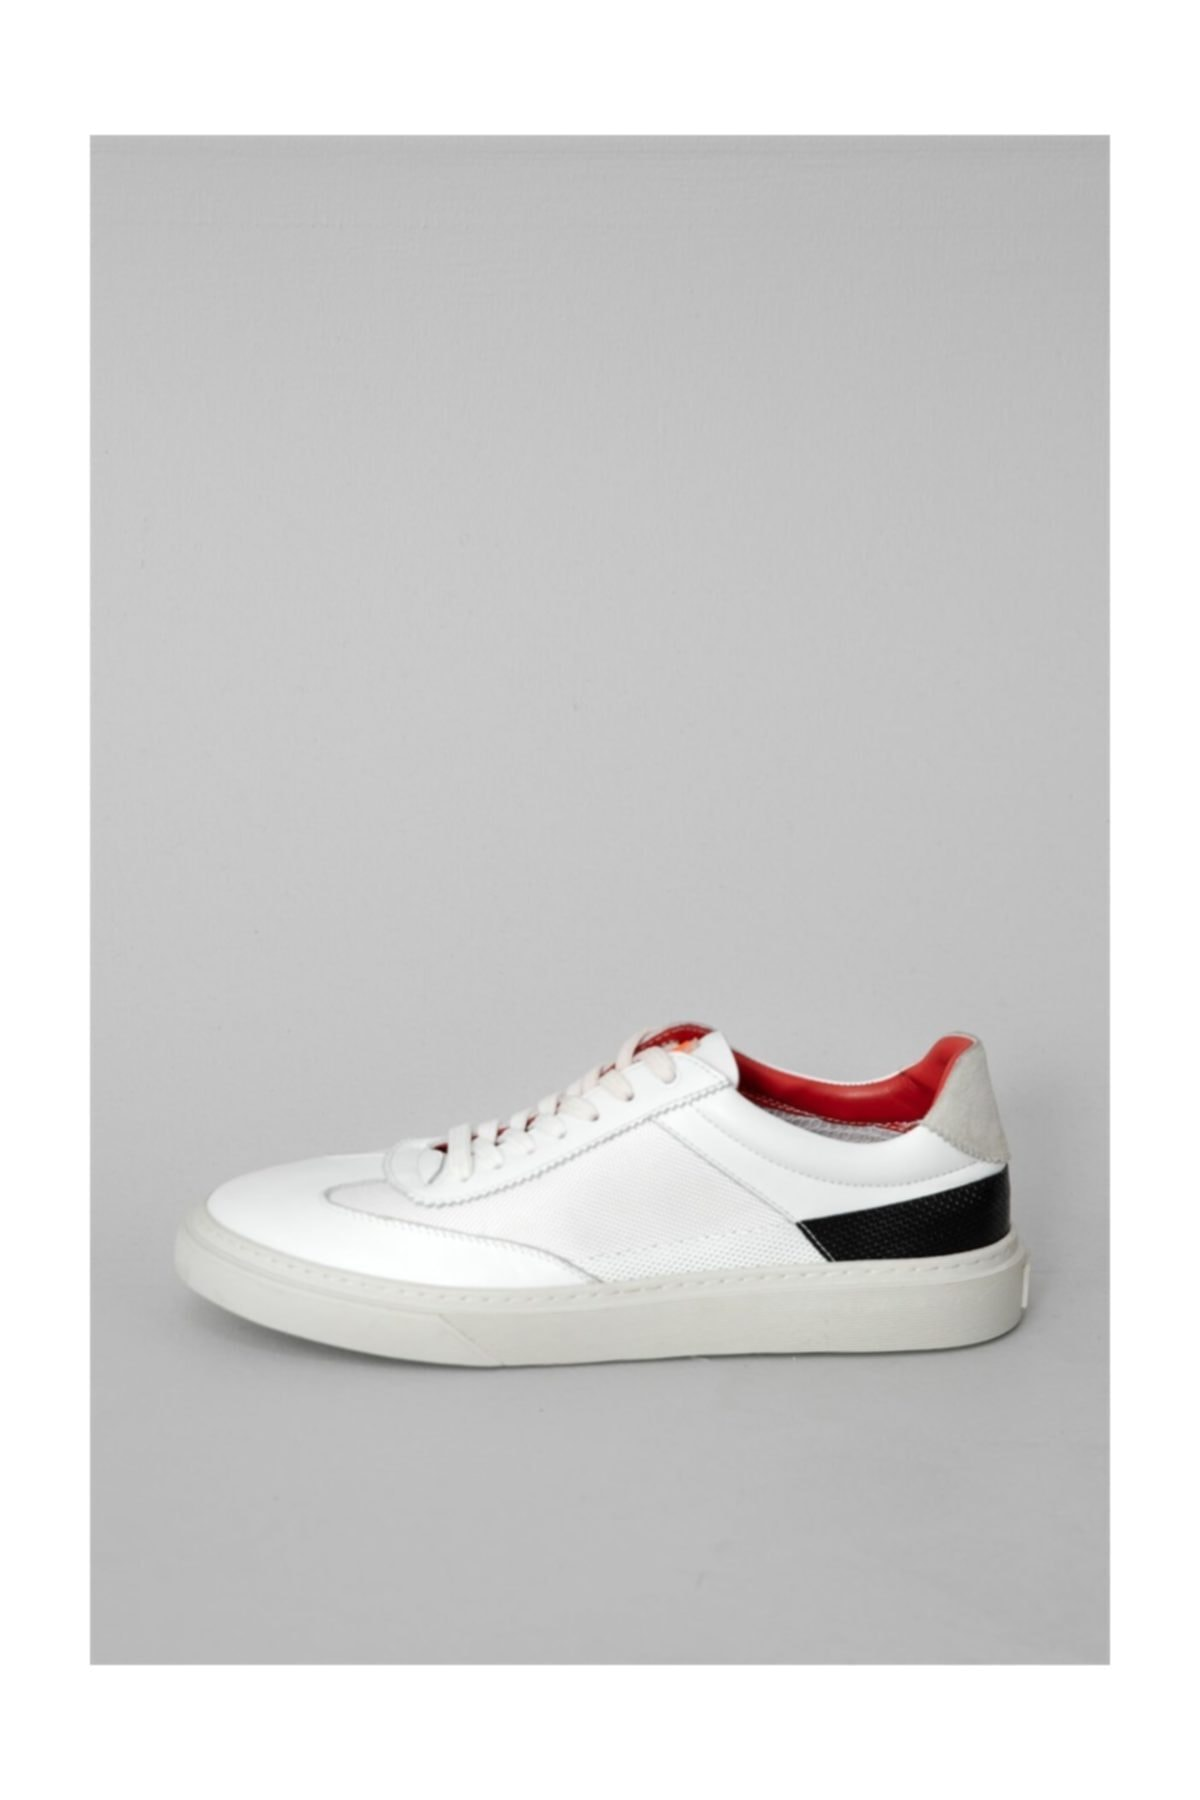 Lufian Tron Deri Sneaker Beyaz 1